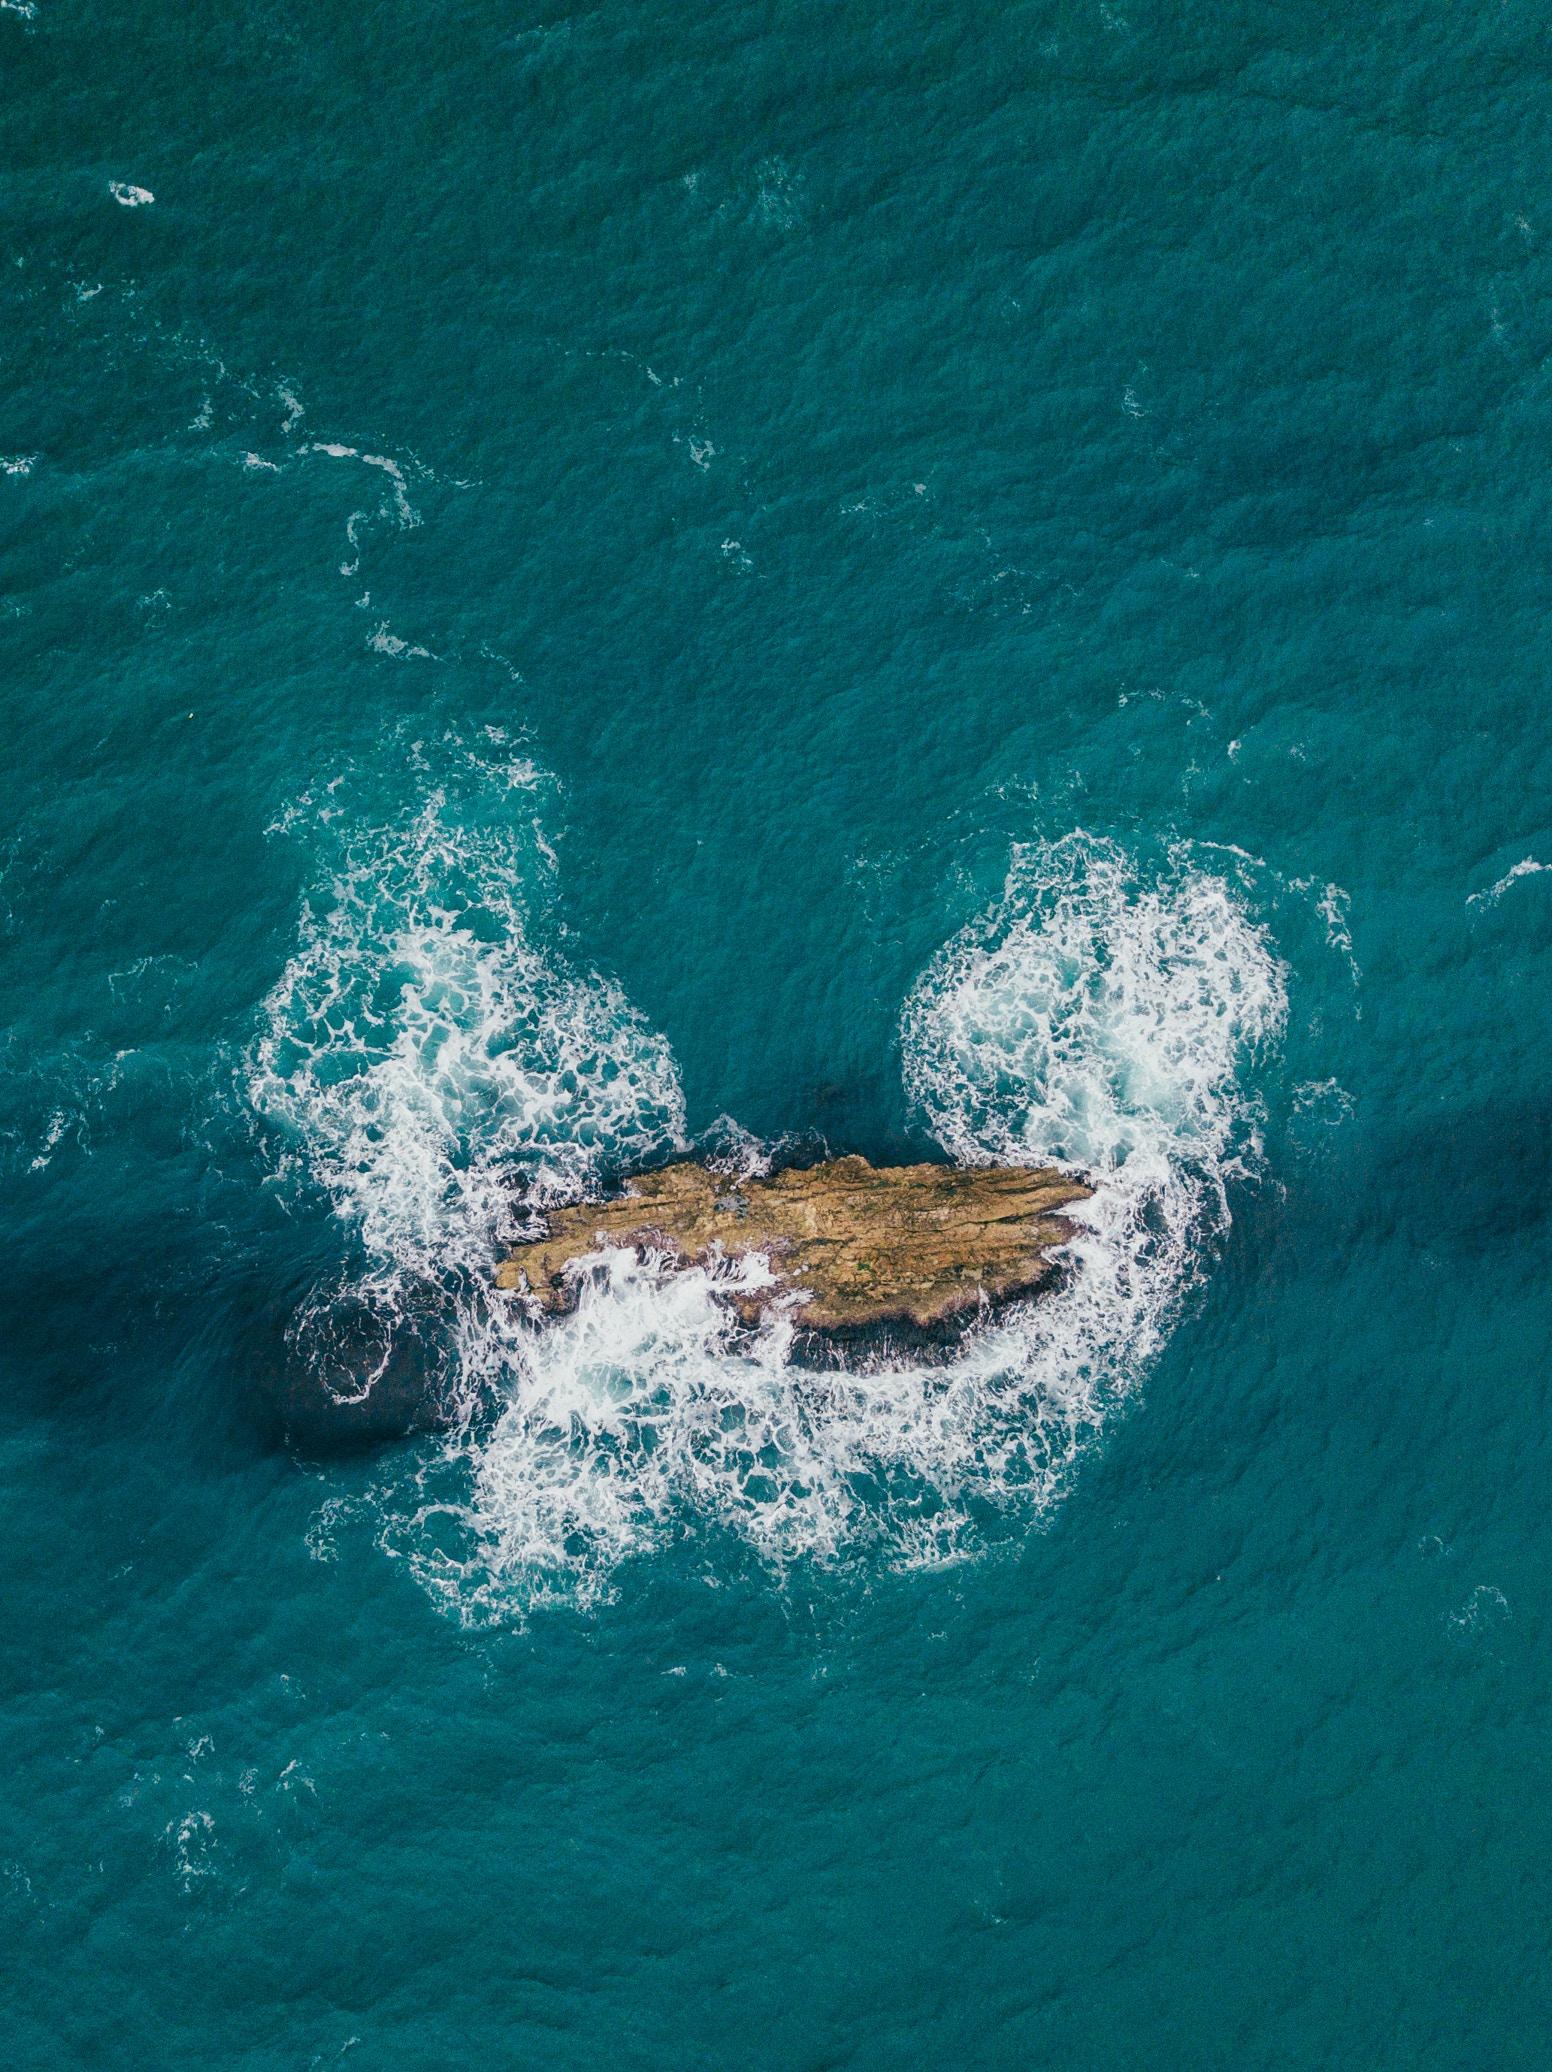 Sea Water Rock Ocean Wave Aerial View Drone Cool Image Photo Wind Marine